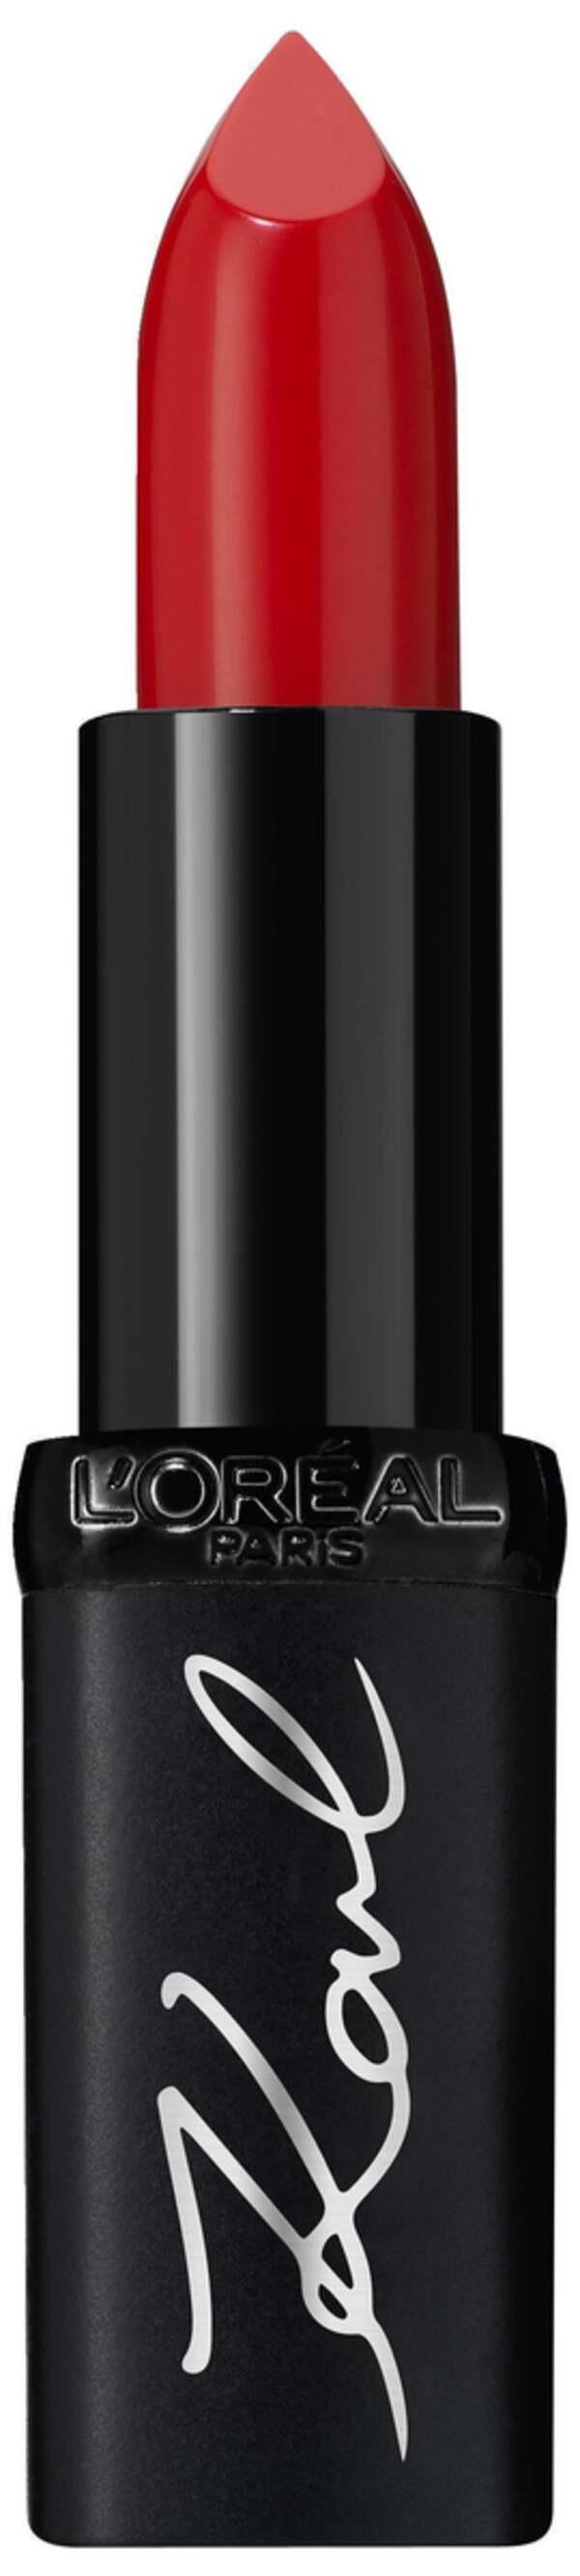 L'Oréal Paris Karl Lagerfeld Lippenstift Provokative